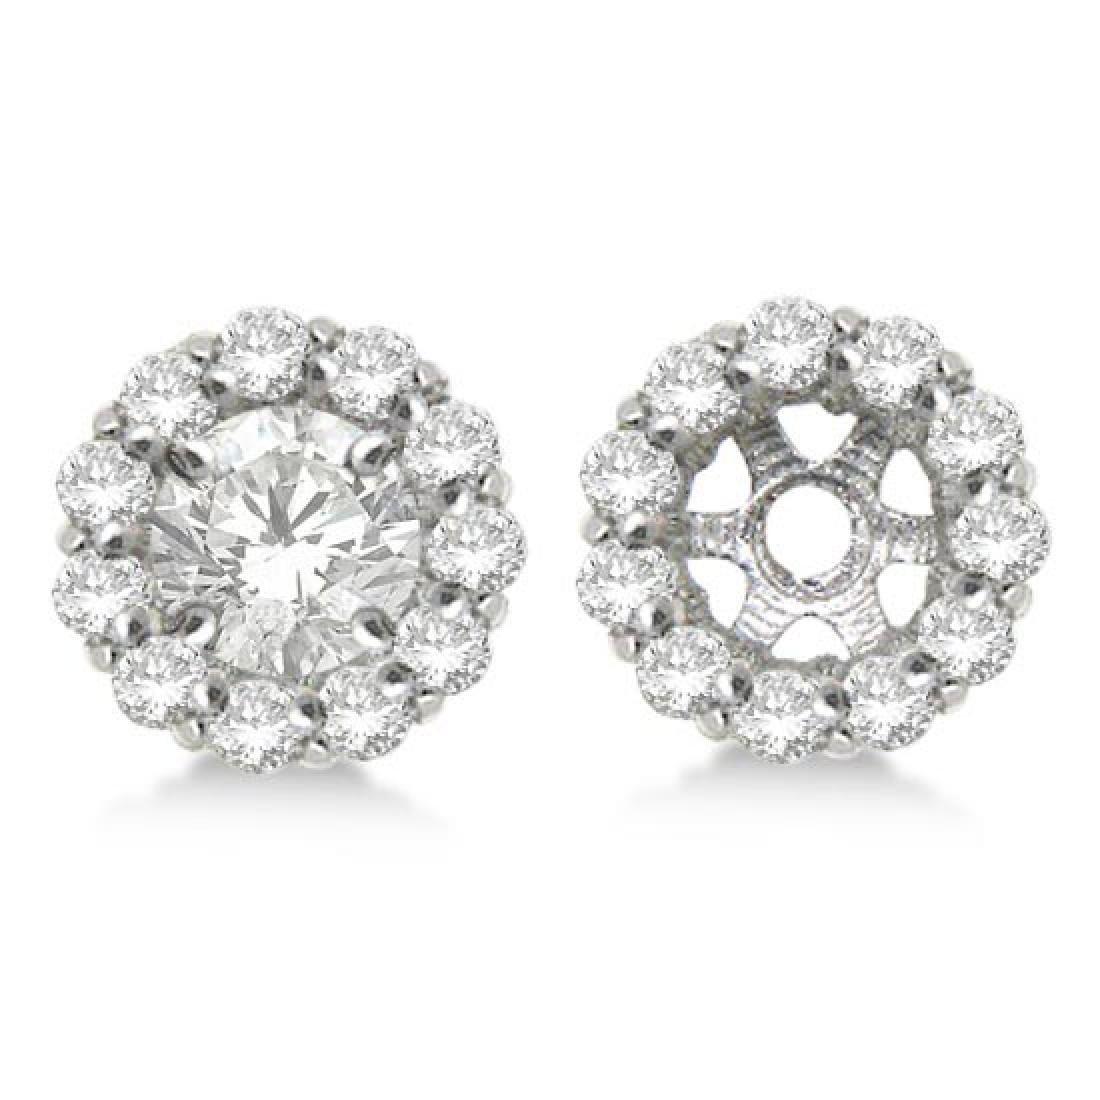 Round Diamond Earring Jackets for 7mm Studs 14K White G